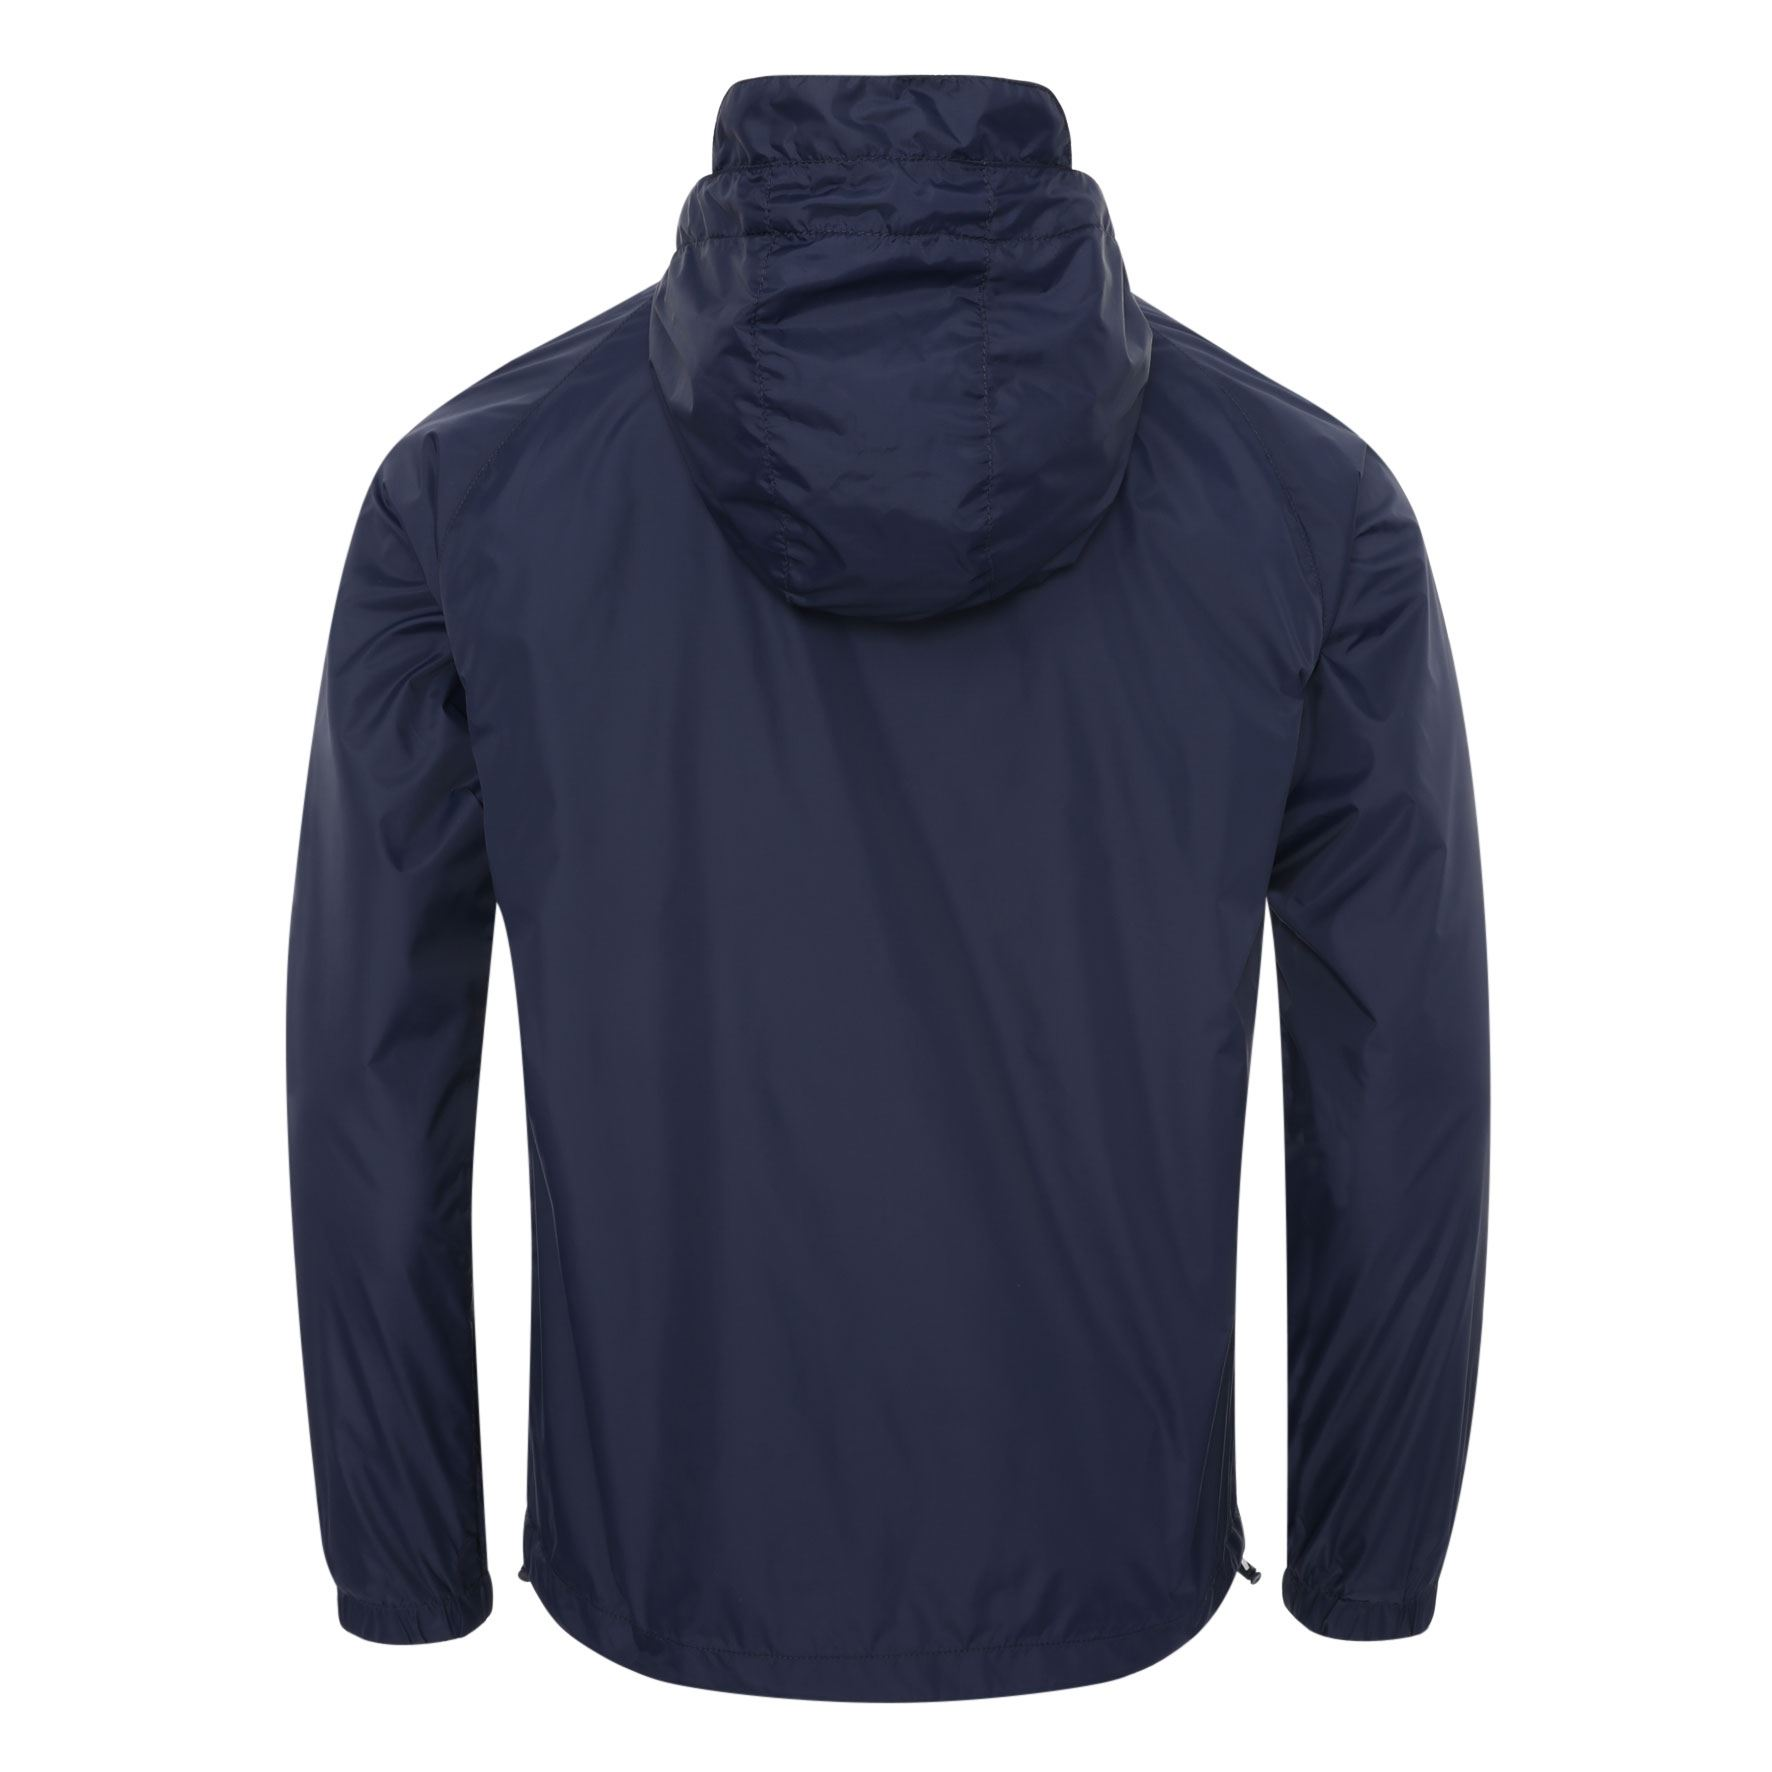 Liverpool FC Mens Navy Contrast Zip Kagool Jacket LFC Official